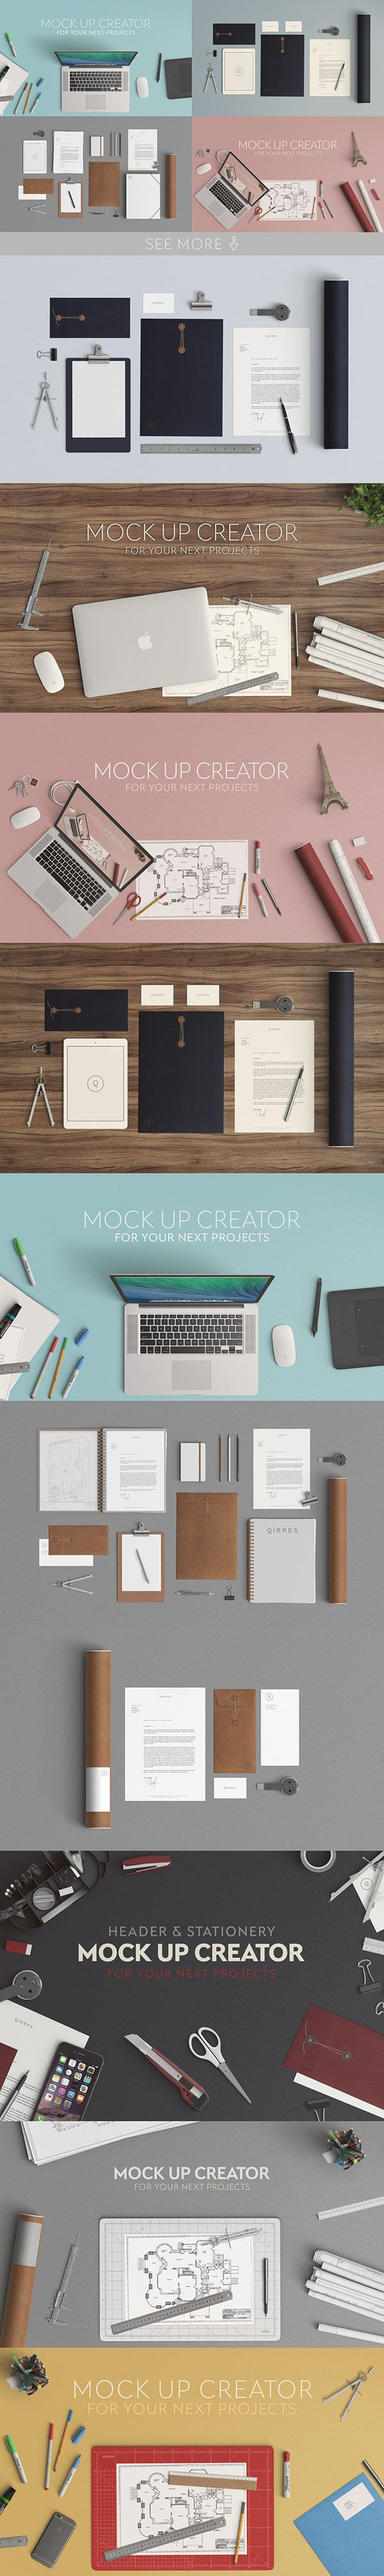 Header & Stationery Mock Up Creator on Behance